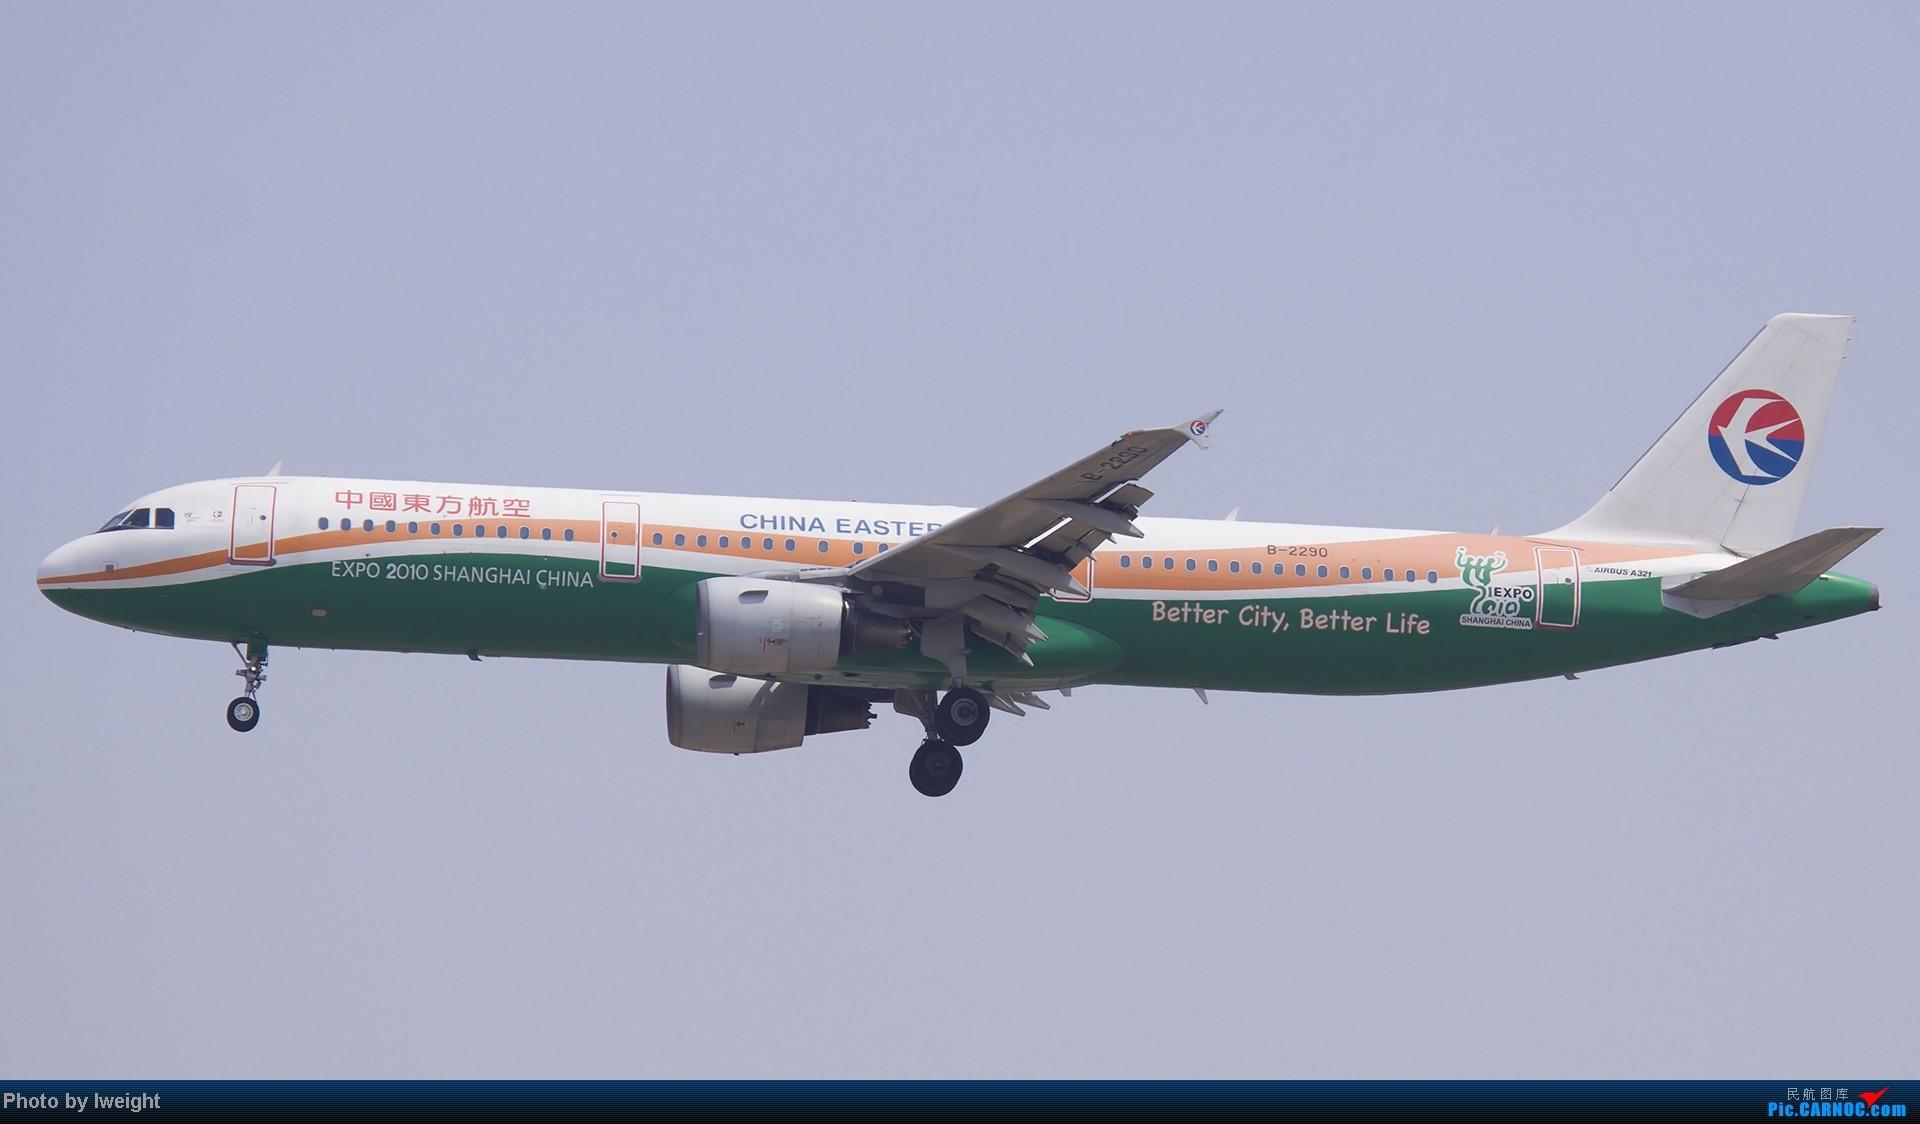 Re:[原创]错过了卡航的巴塞罗那号,只有这些大路货了,泪奔啊 AIRBUS A321-200 B-2290 中国北京首都机场